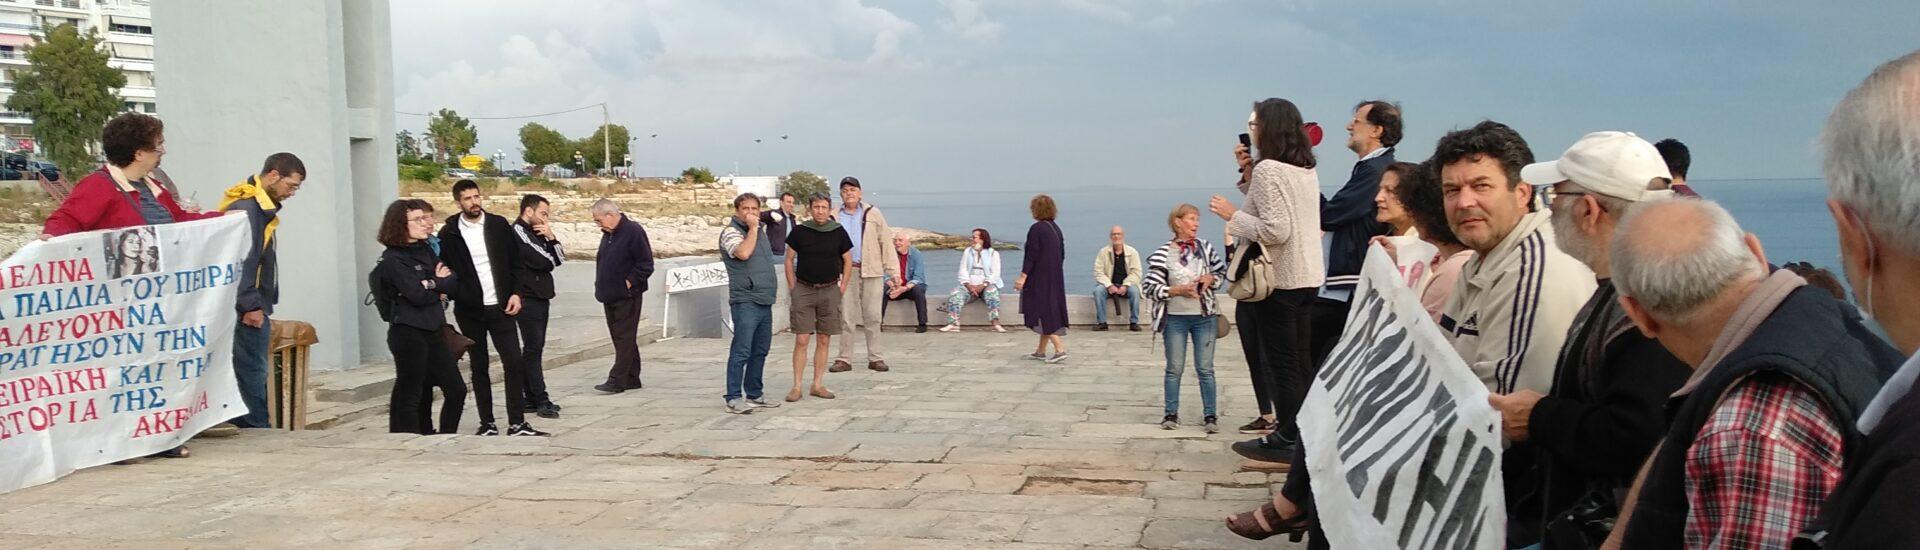 'Oχι λιμάνι στην Πειραϊκή